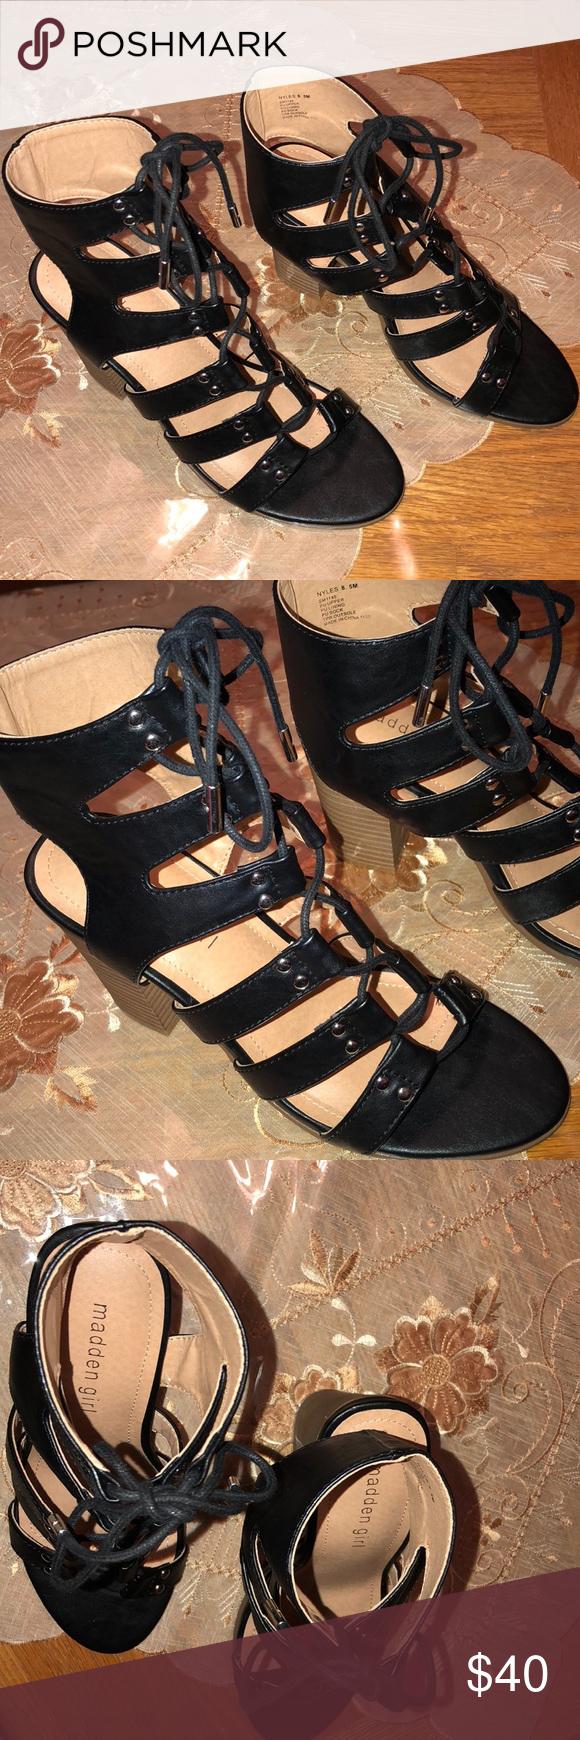 83a610215f92 Madden Girl Nyles Women s Sandals